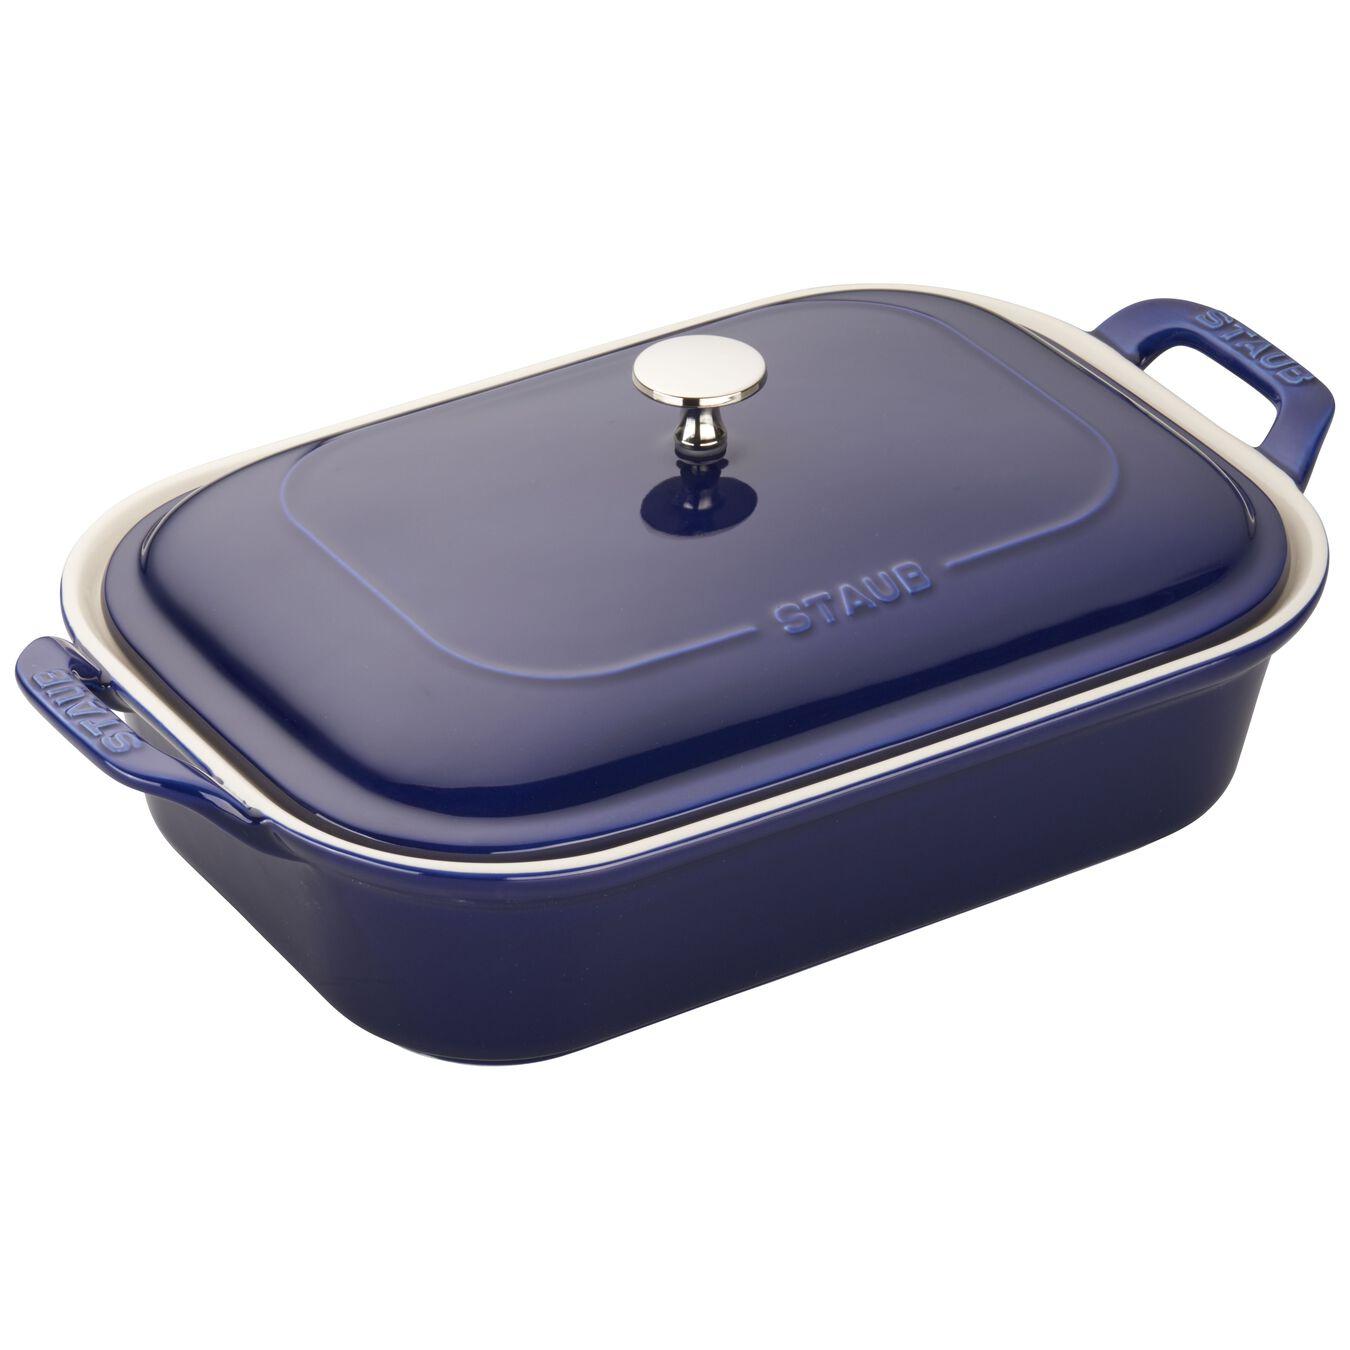 12-inch x 8-inch Rectangular Covered Baking Dish - Dark Blue,,large 1